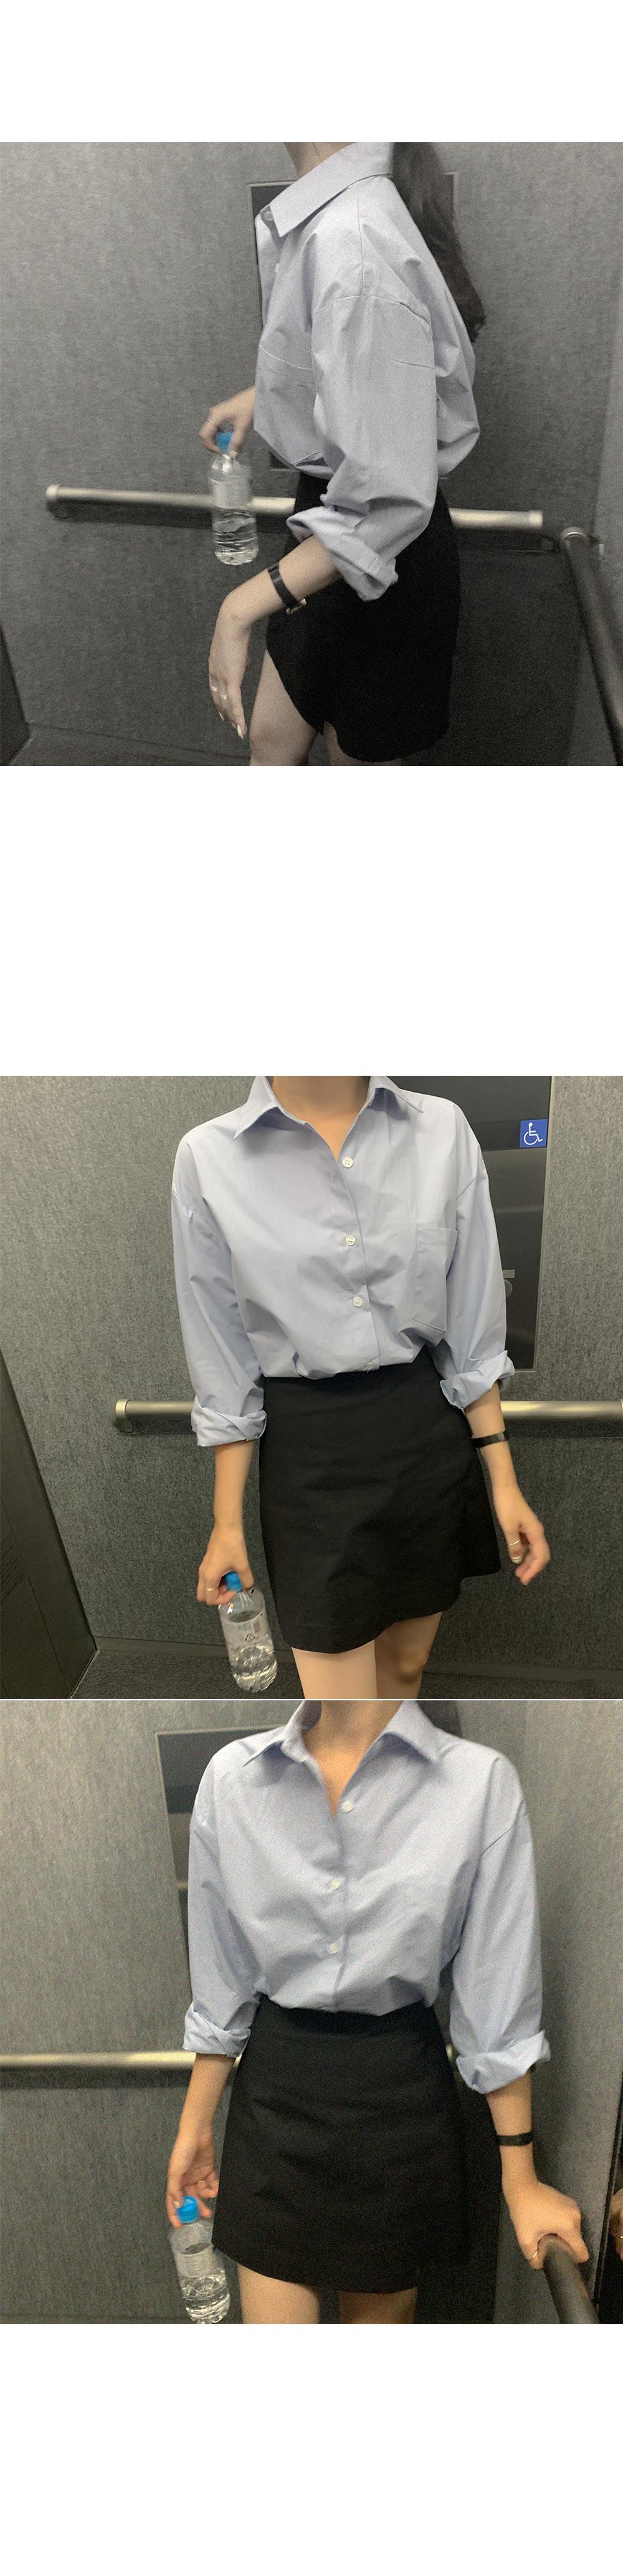 Wenan colored cotton shirt